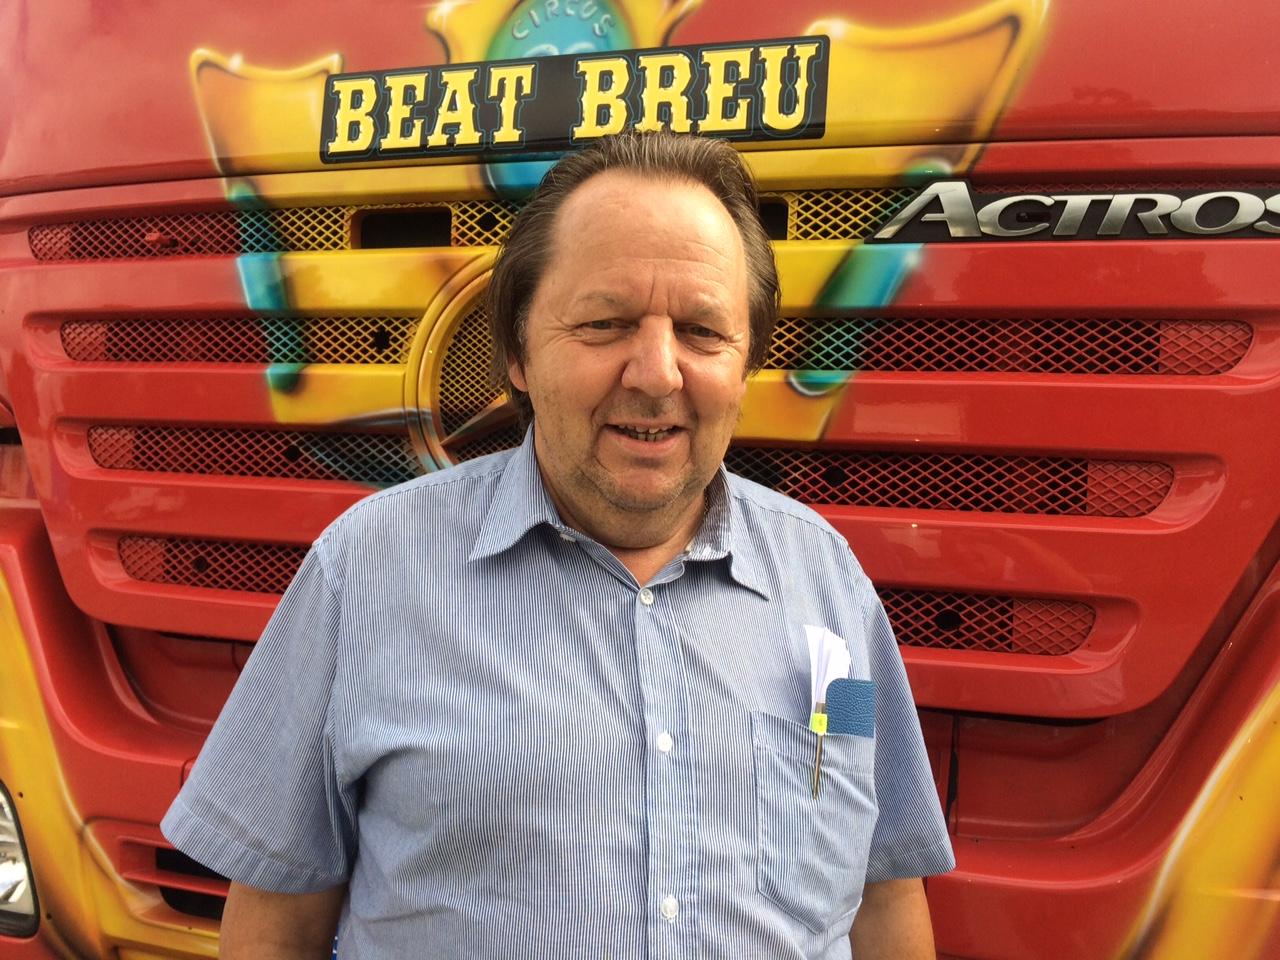 Circus Beat Breu startet Tournee in Winterthur